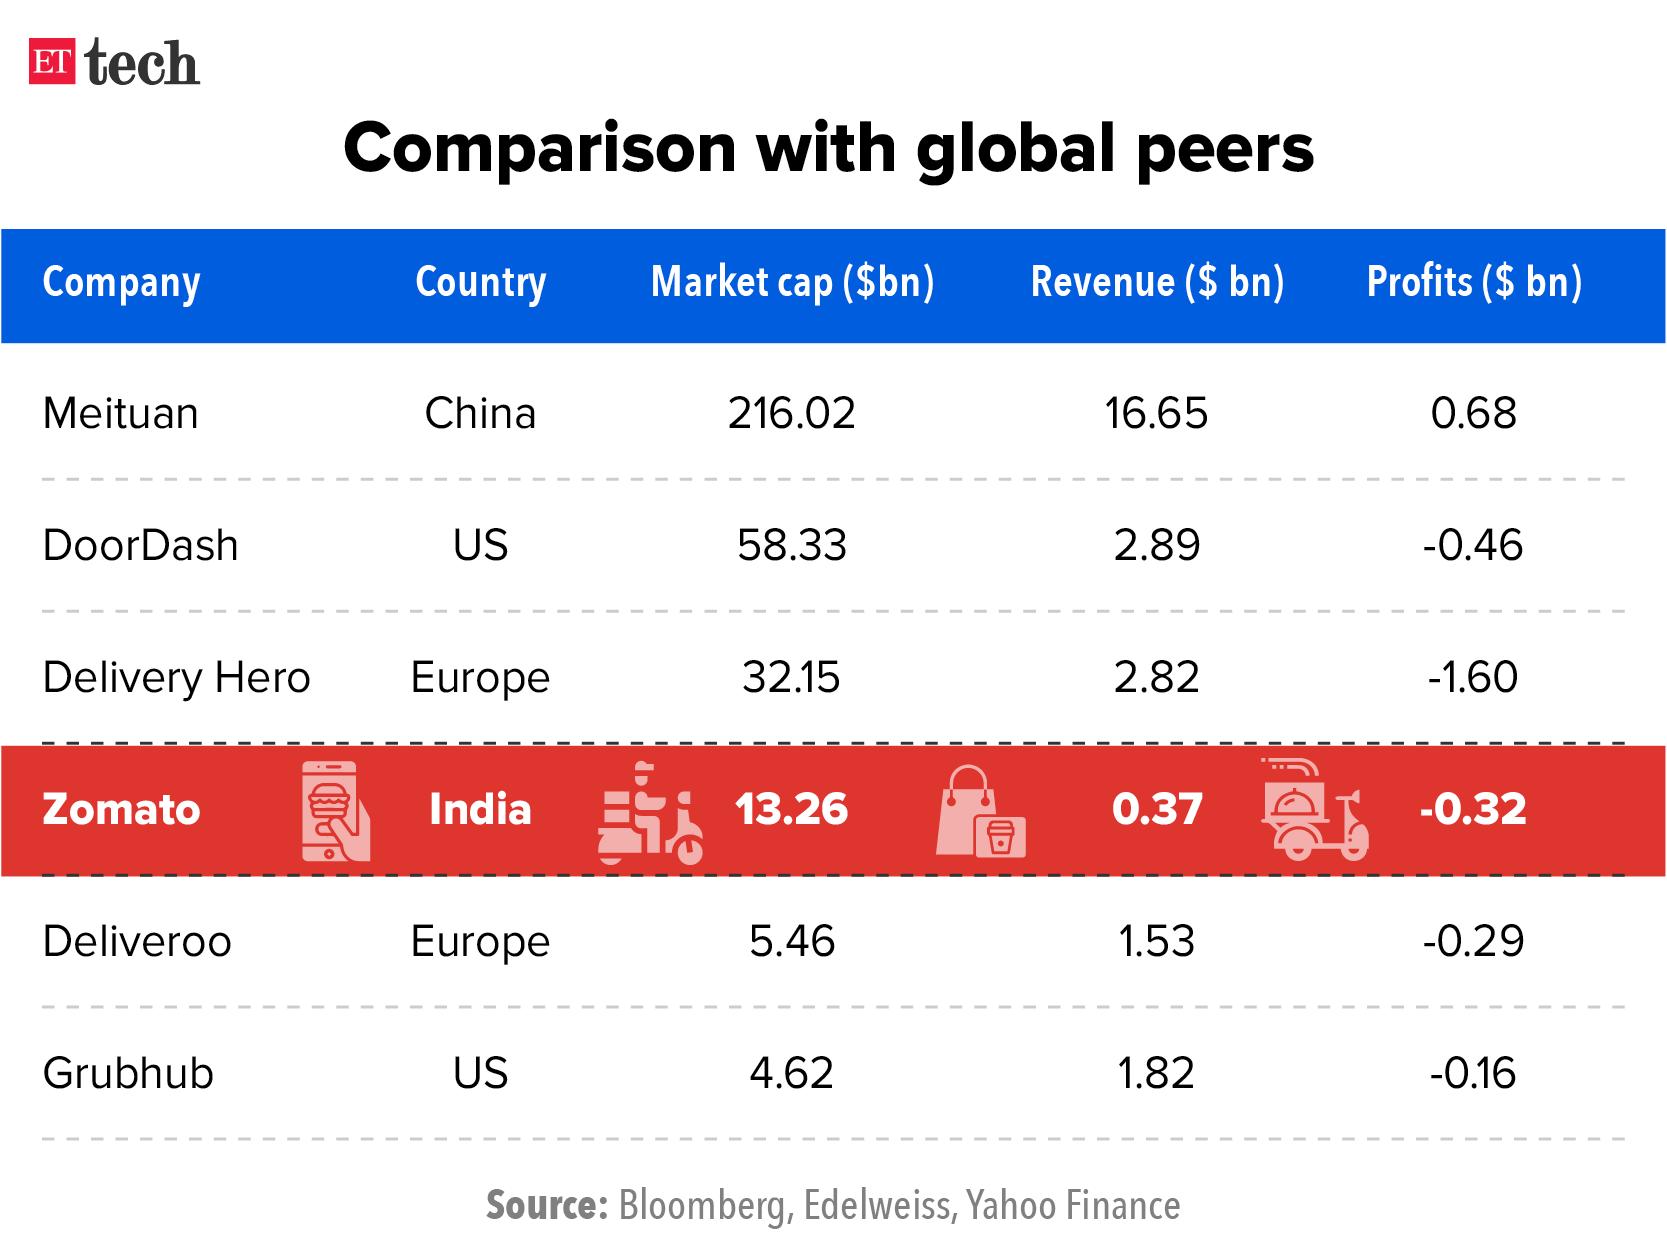 Zomato vs global peers